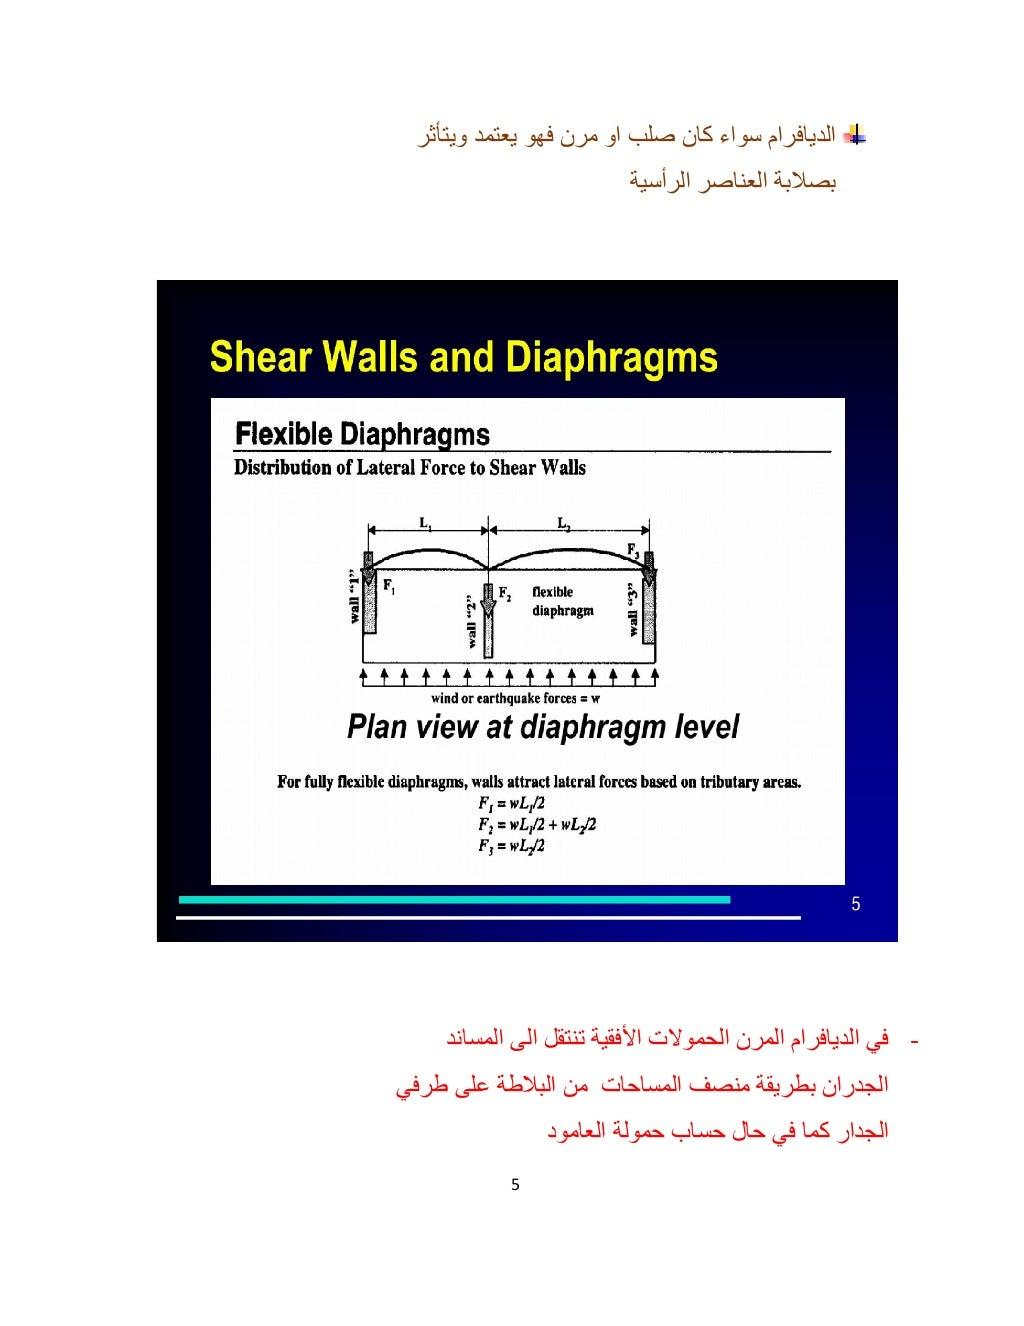 rigid-semi-rigid-flexible-diaphragm-for-seismic-analysis-5-1024.jpg